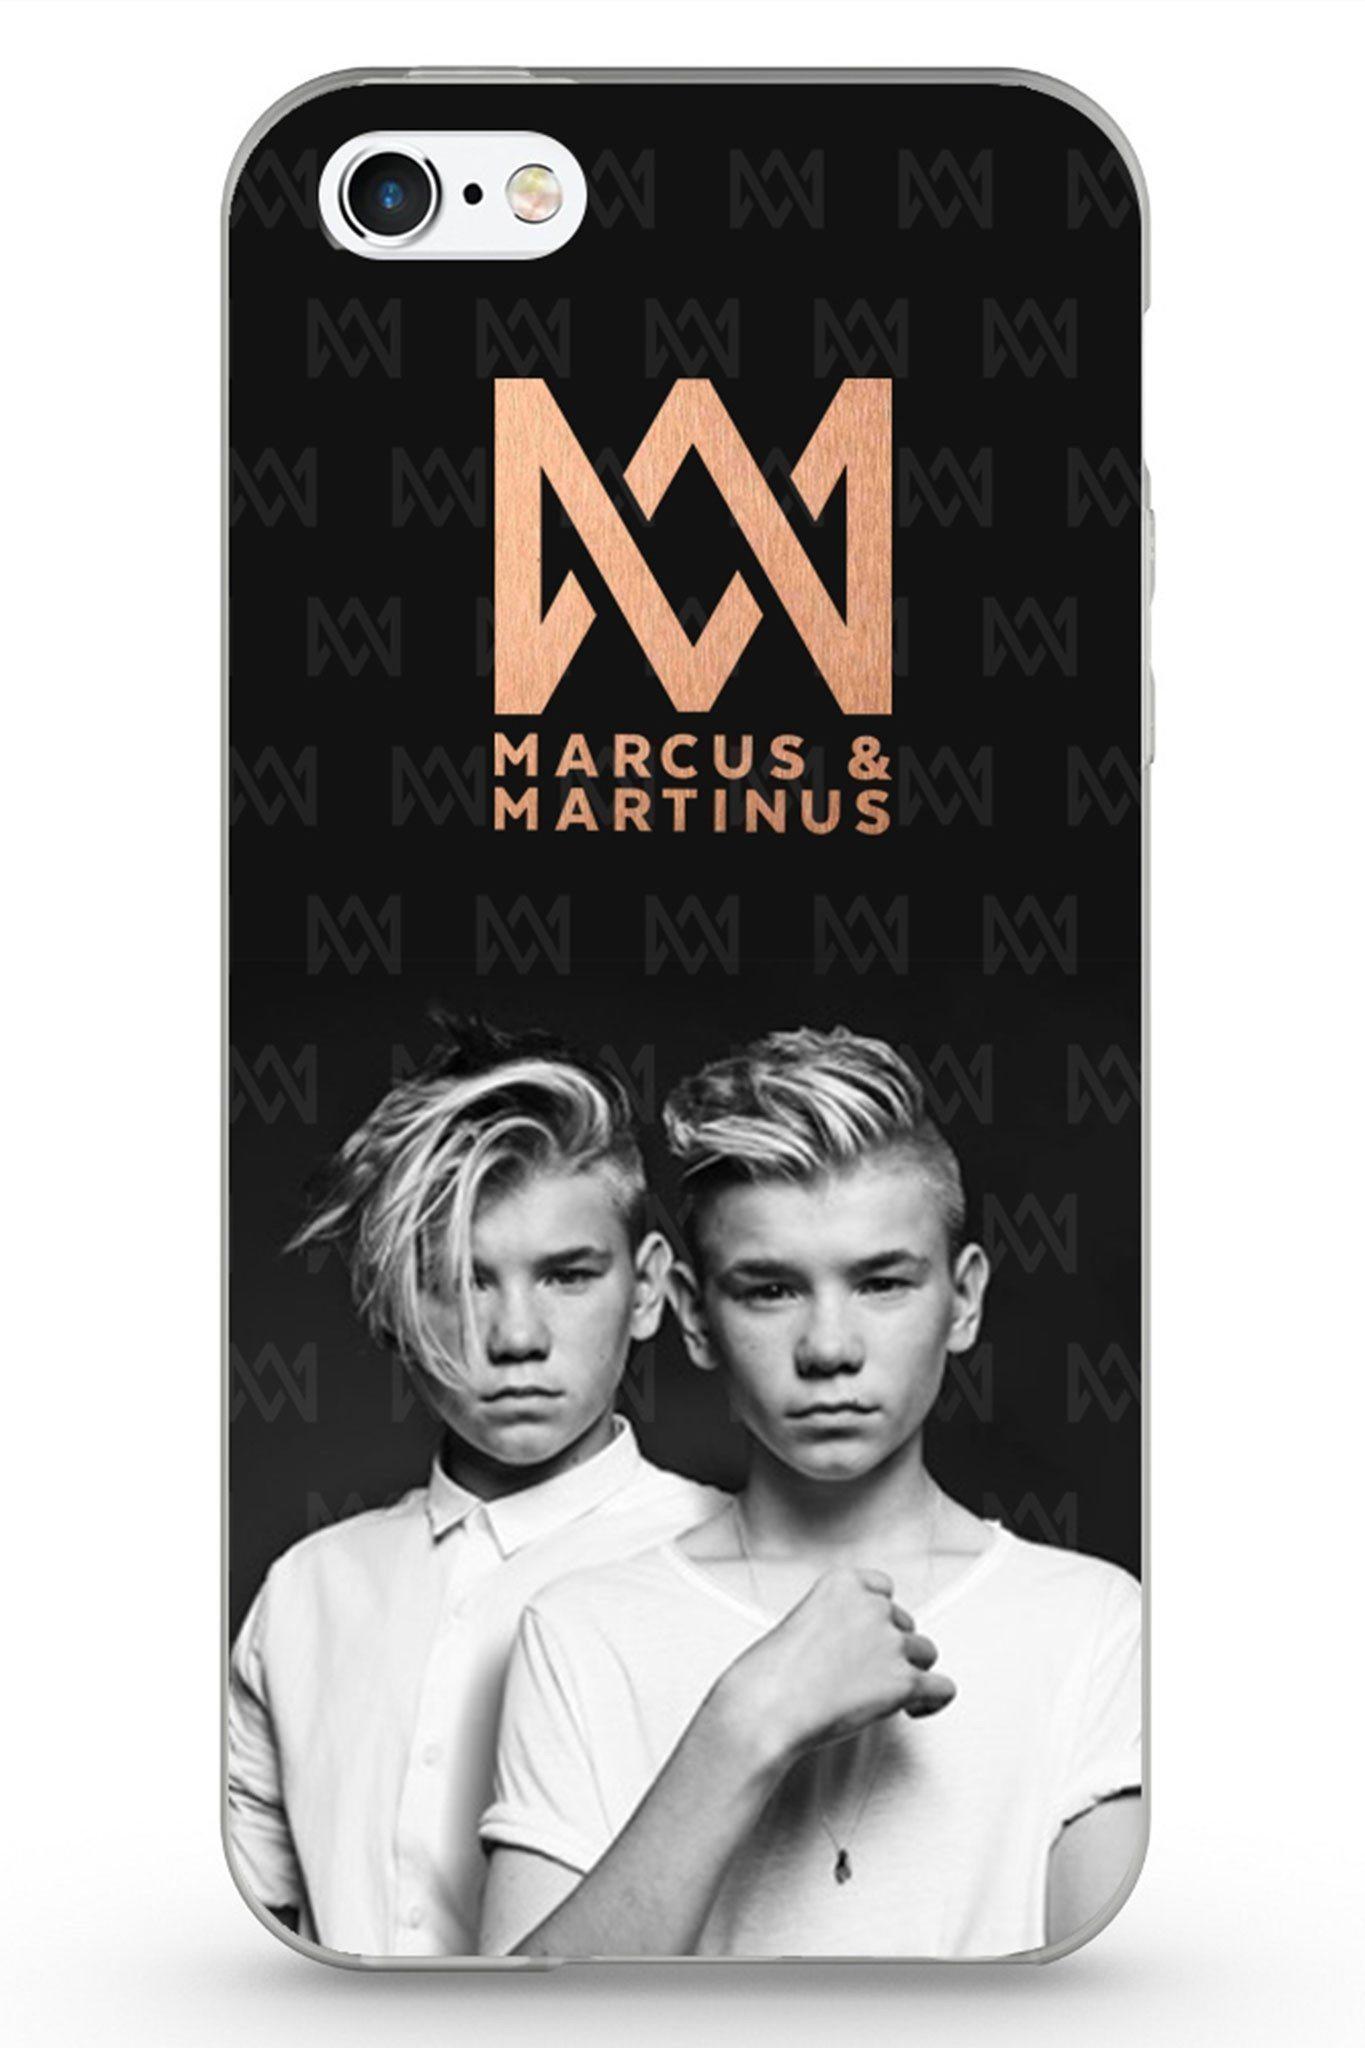 bästa kvalitet på fötter kl pålitlig kvalitet Skal till iPhone 6/6s - Marcus & Martinus (321211475) ᐈ Köp på ...